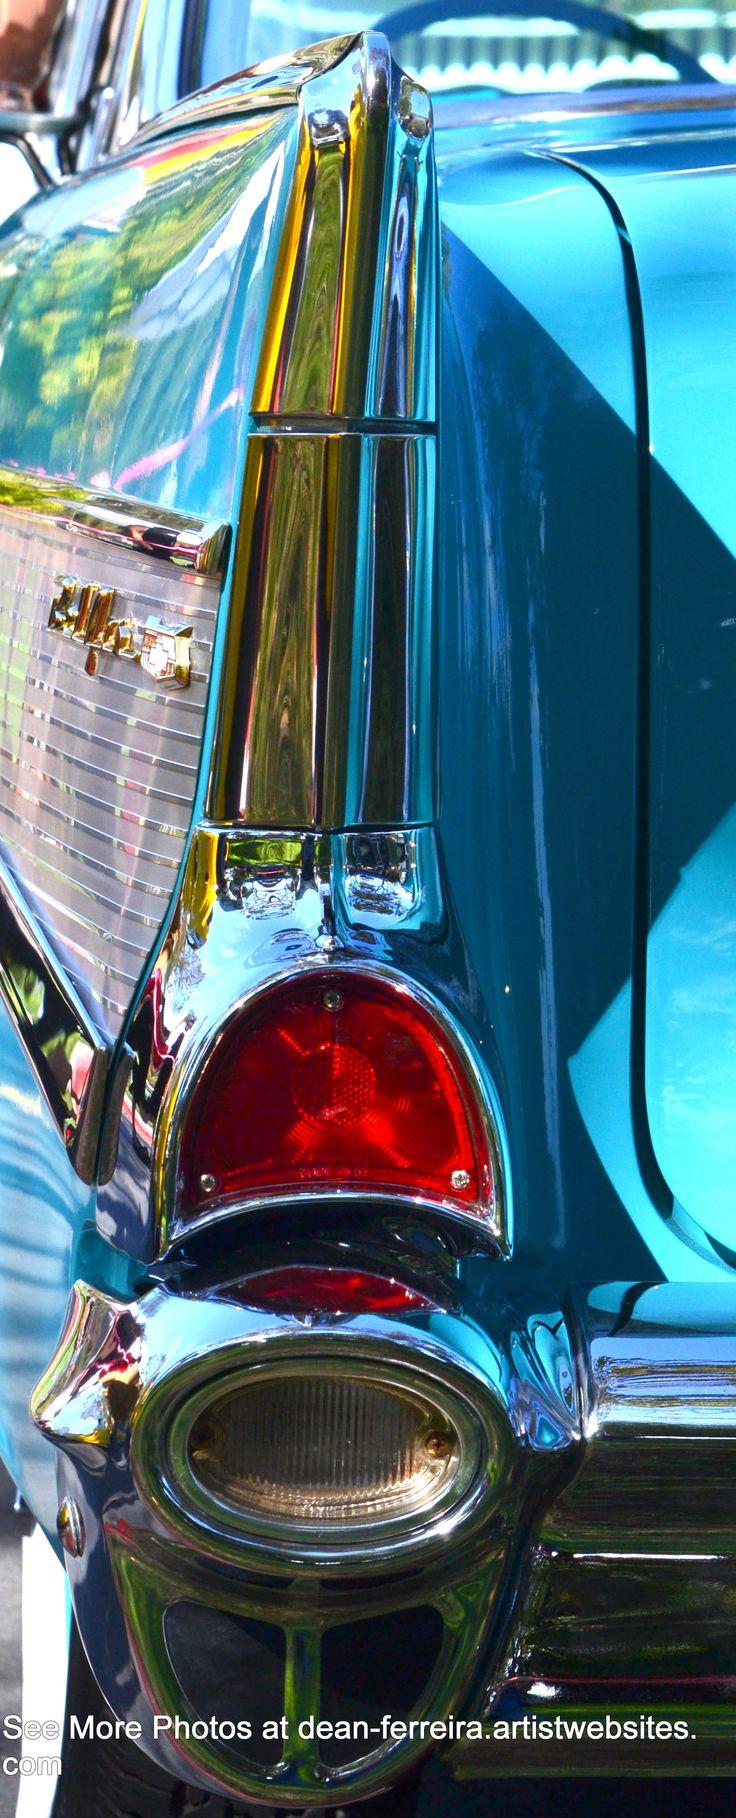 Aqua 1957 Chevy Fin and Tail Light by http://dean-ferreira.artistwebsites.com/?tab=artwork